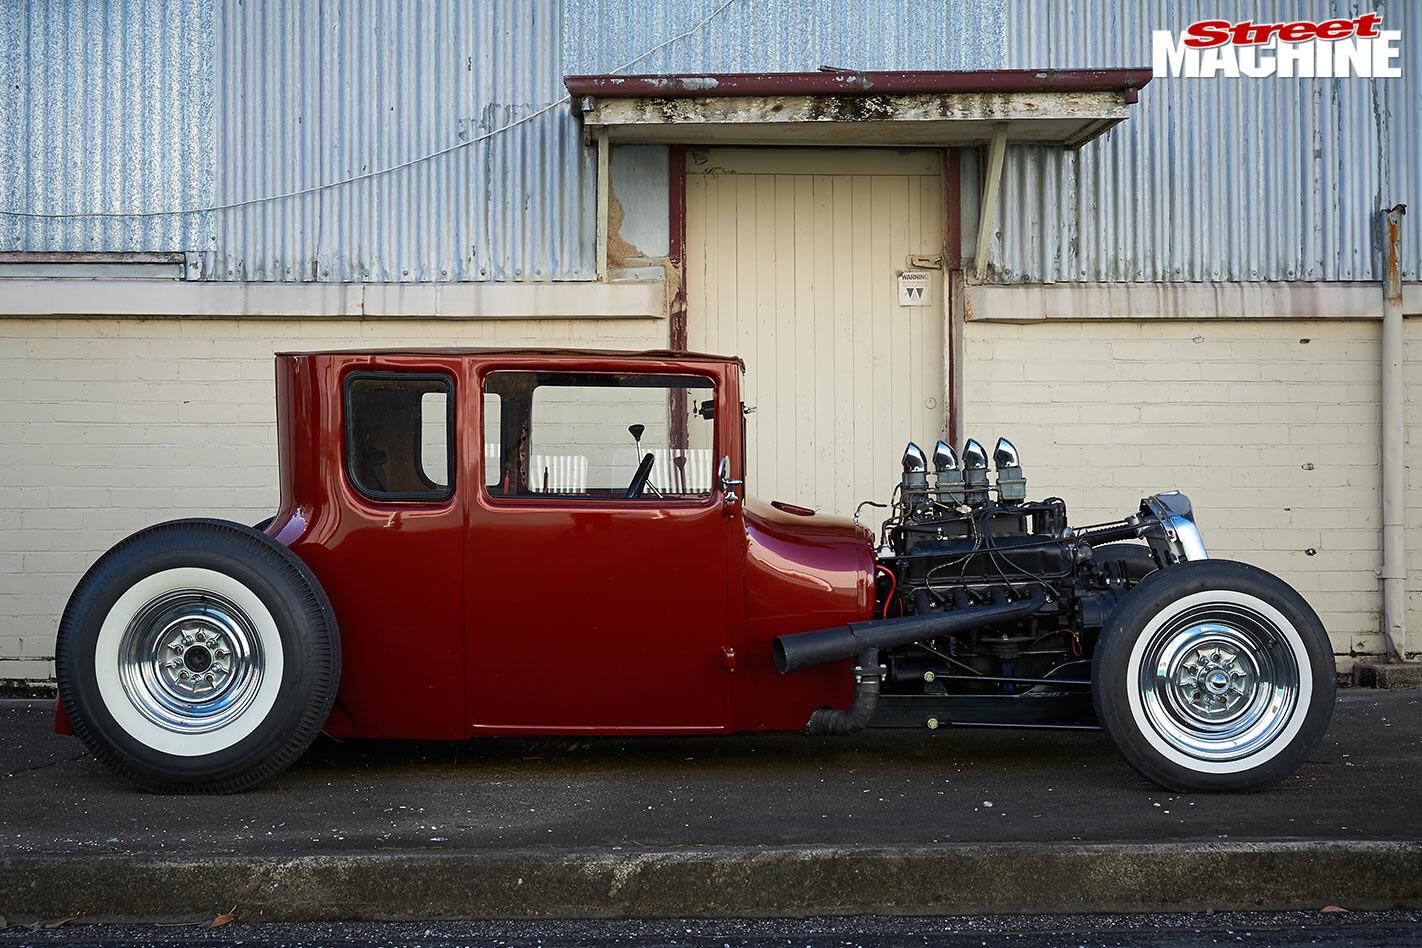 1927 Ford Model T side